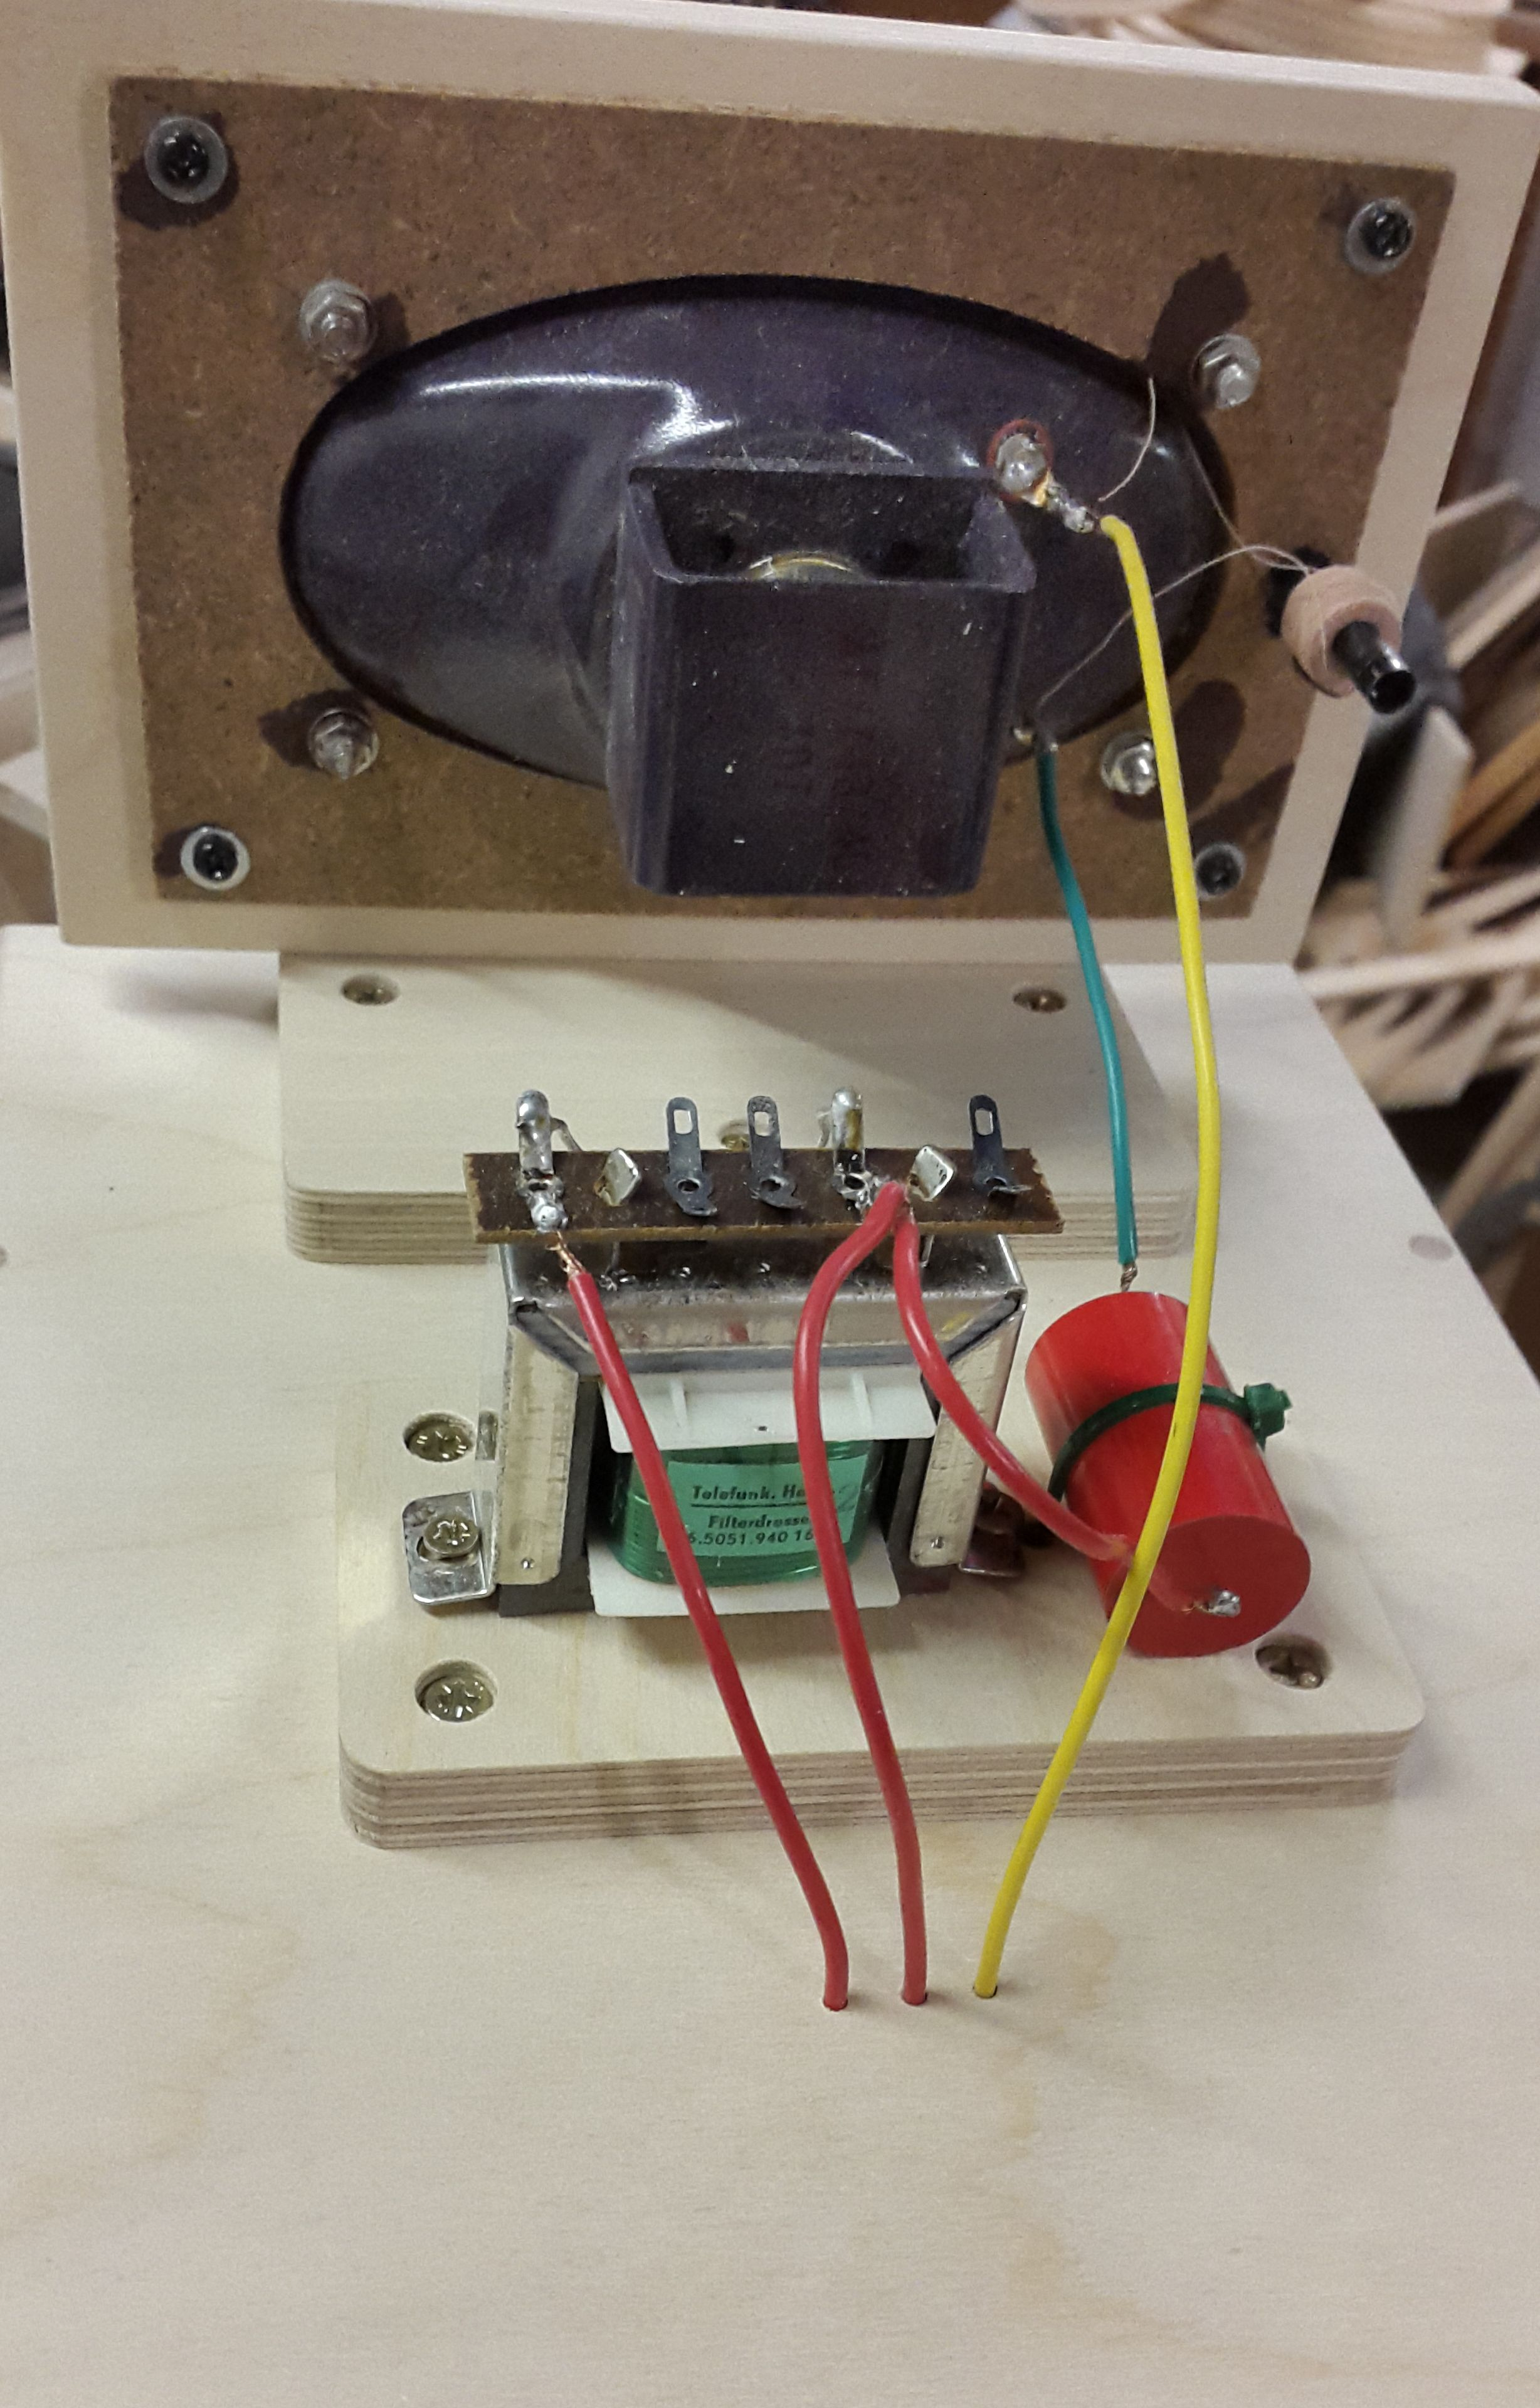 Film Capacitor Wiring Data Diagrams Car Telefunky Telefunken Inductor Metalised Polypropylene Rh Pinterest Com Audio